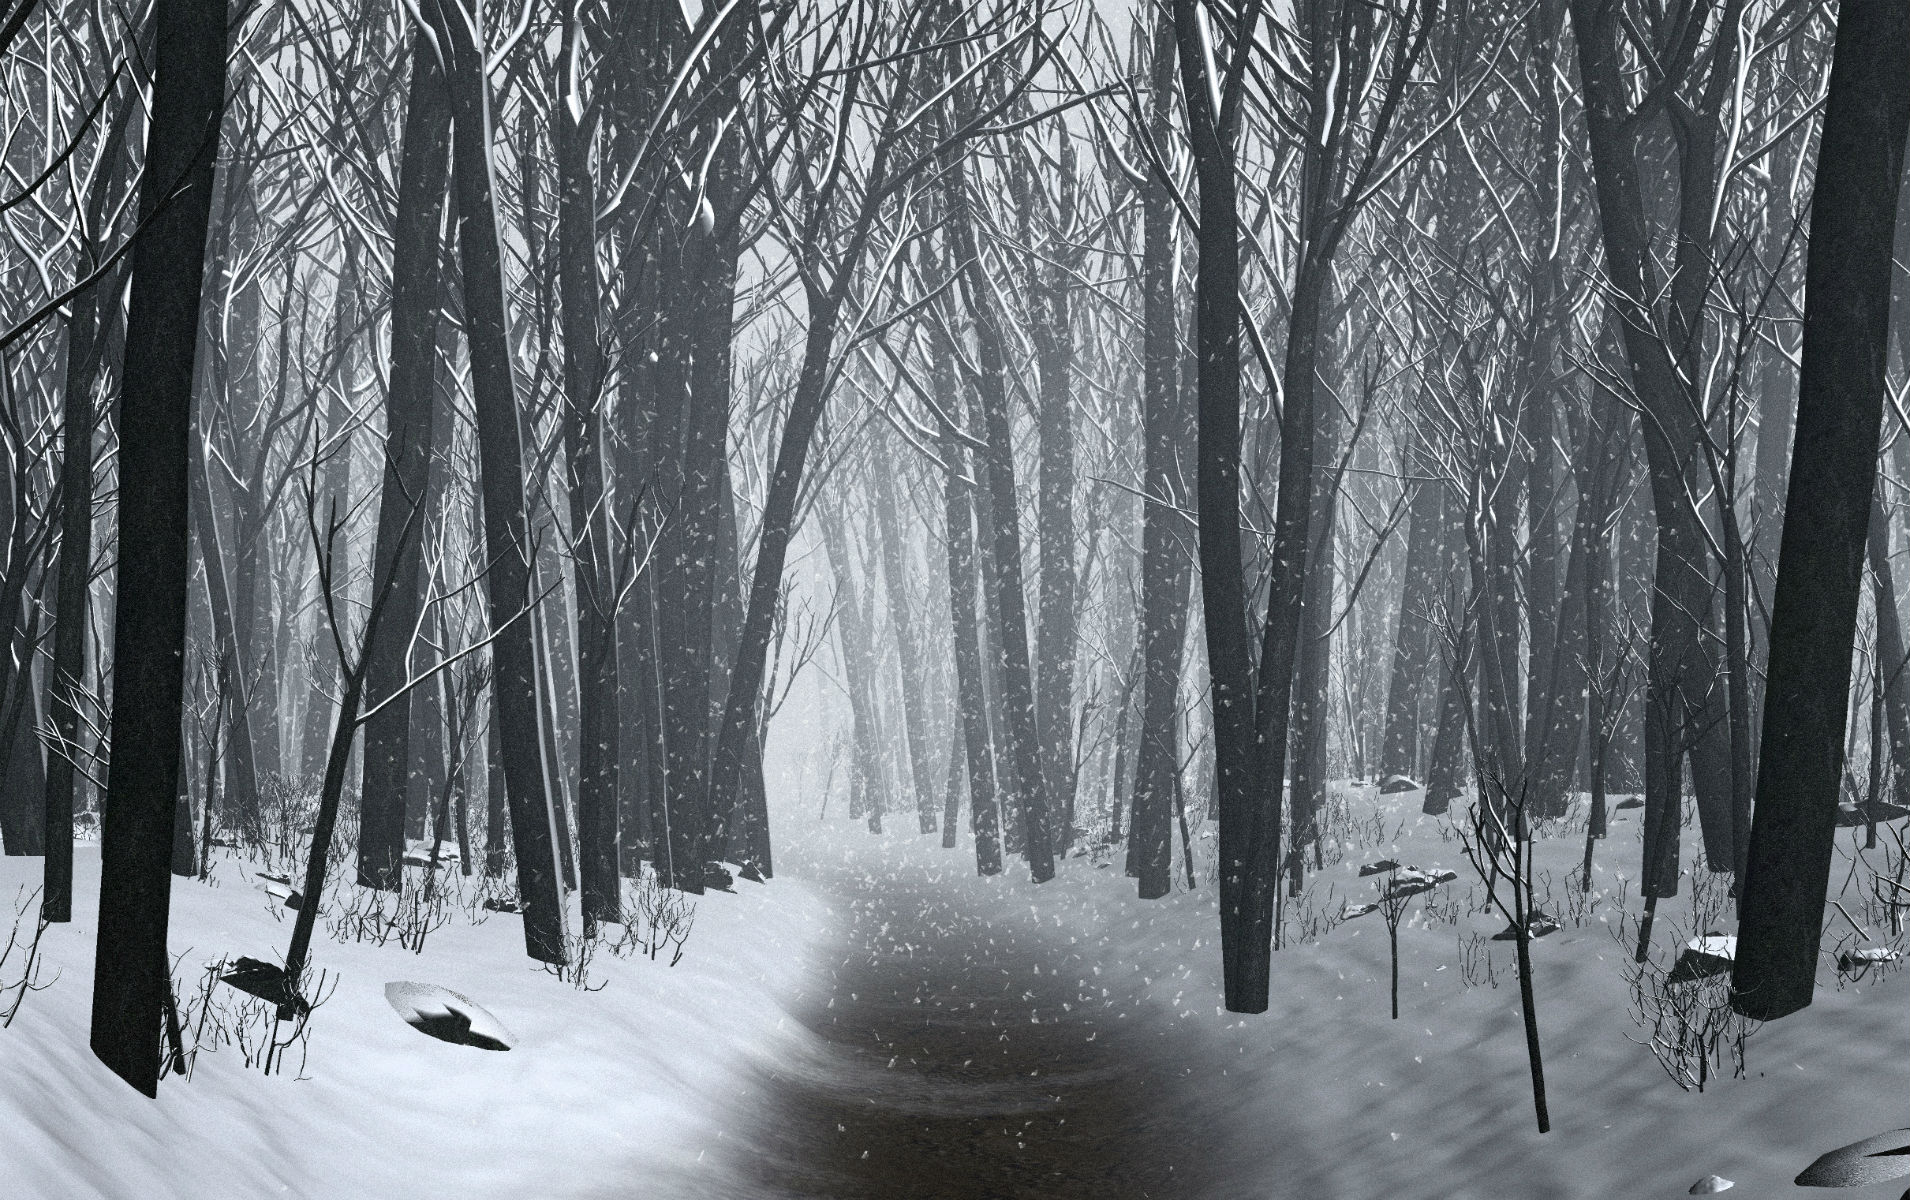 Artistic - Winter  Wallpaper